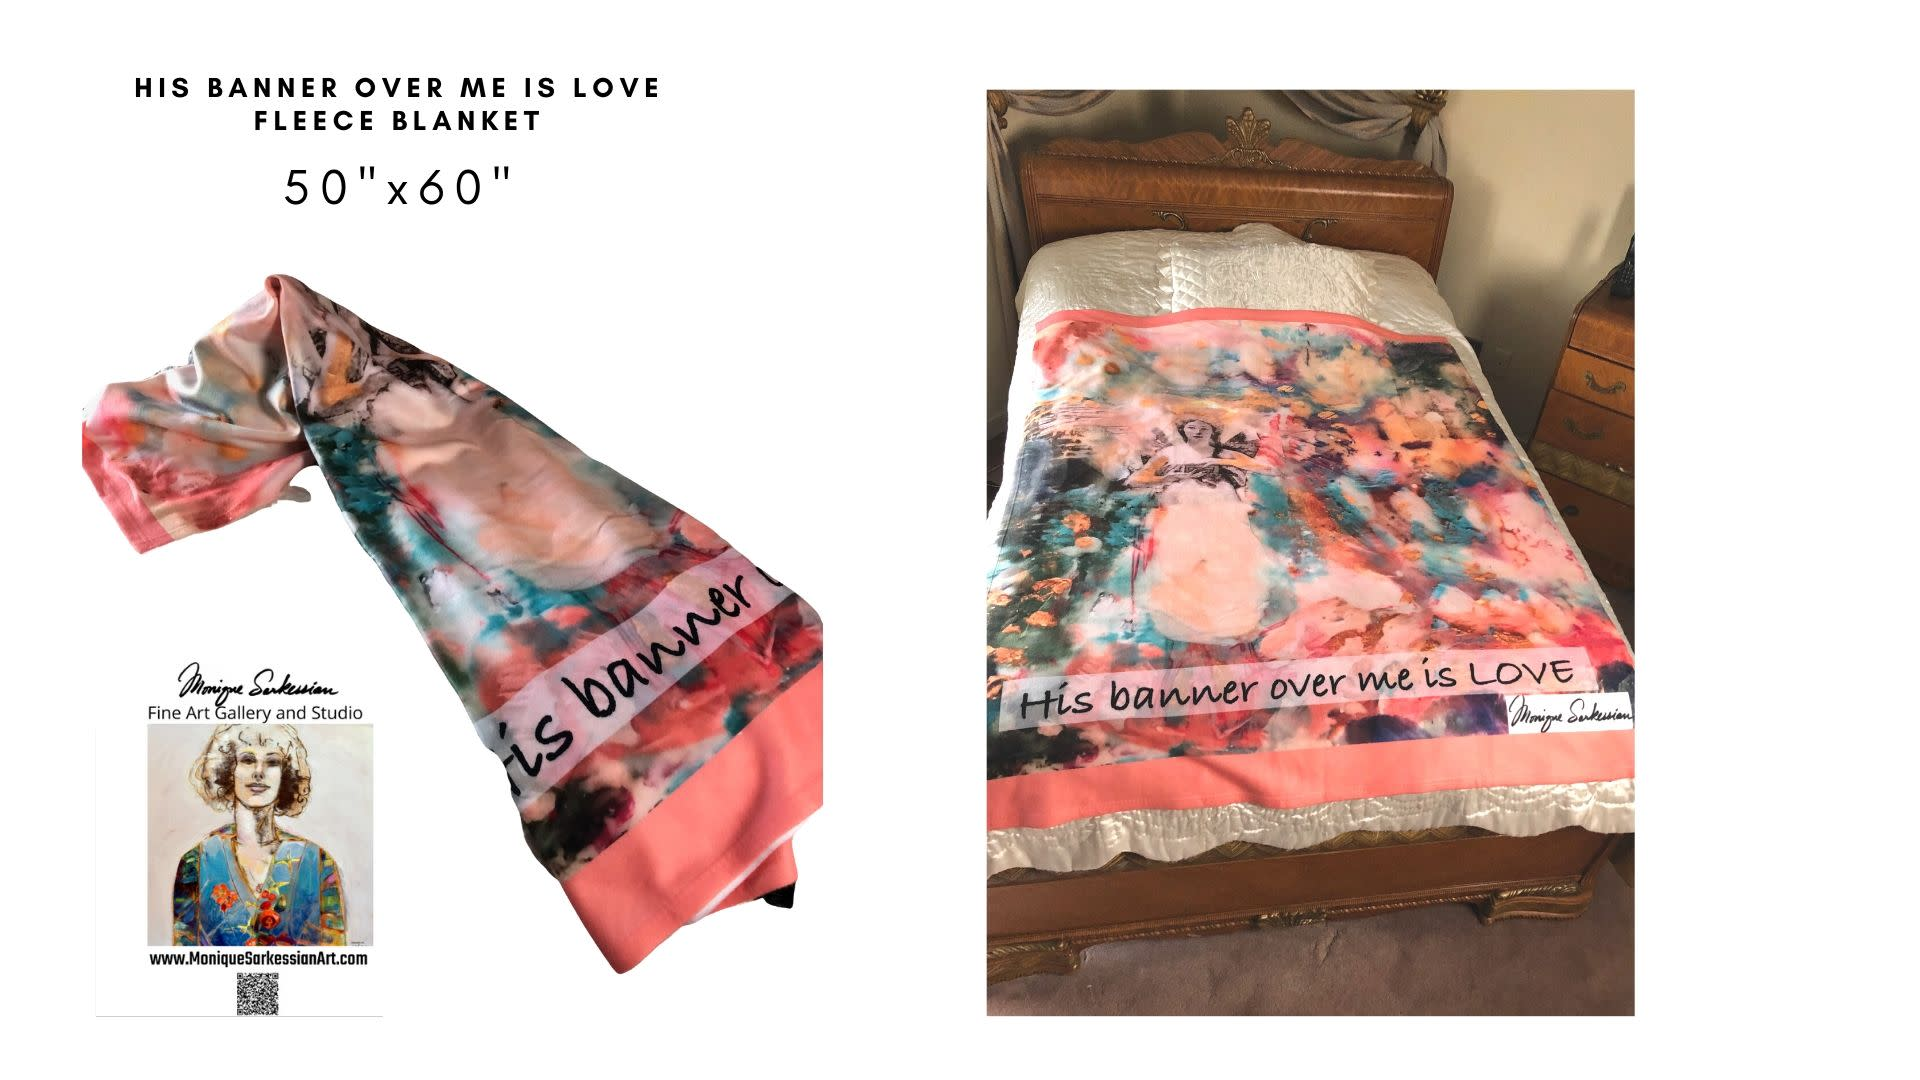 Monique sarkessian his banner over me is love blanket x3jg66